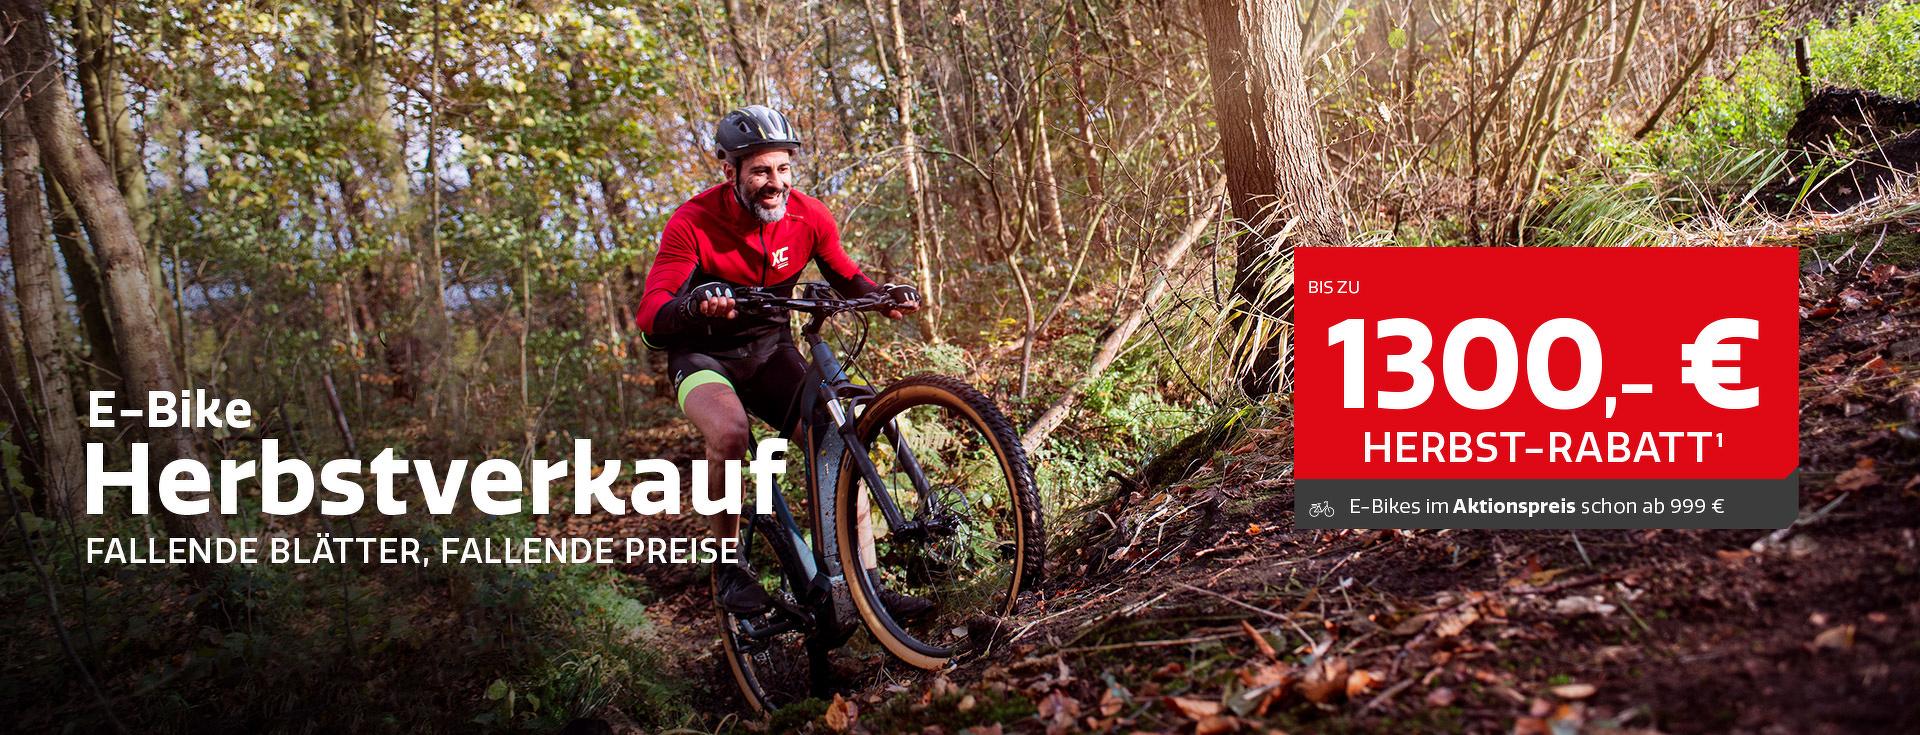 E-Bike Herbstverkauf